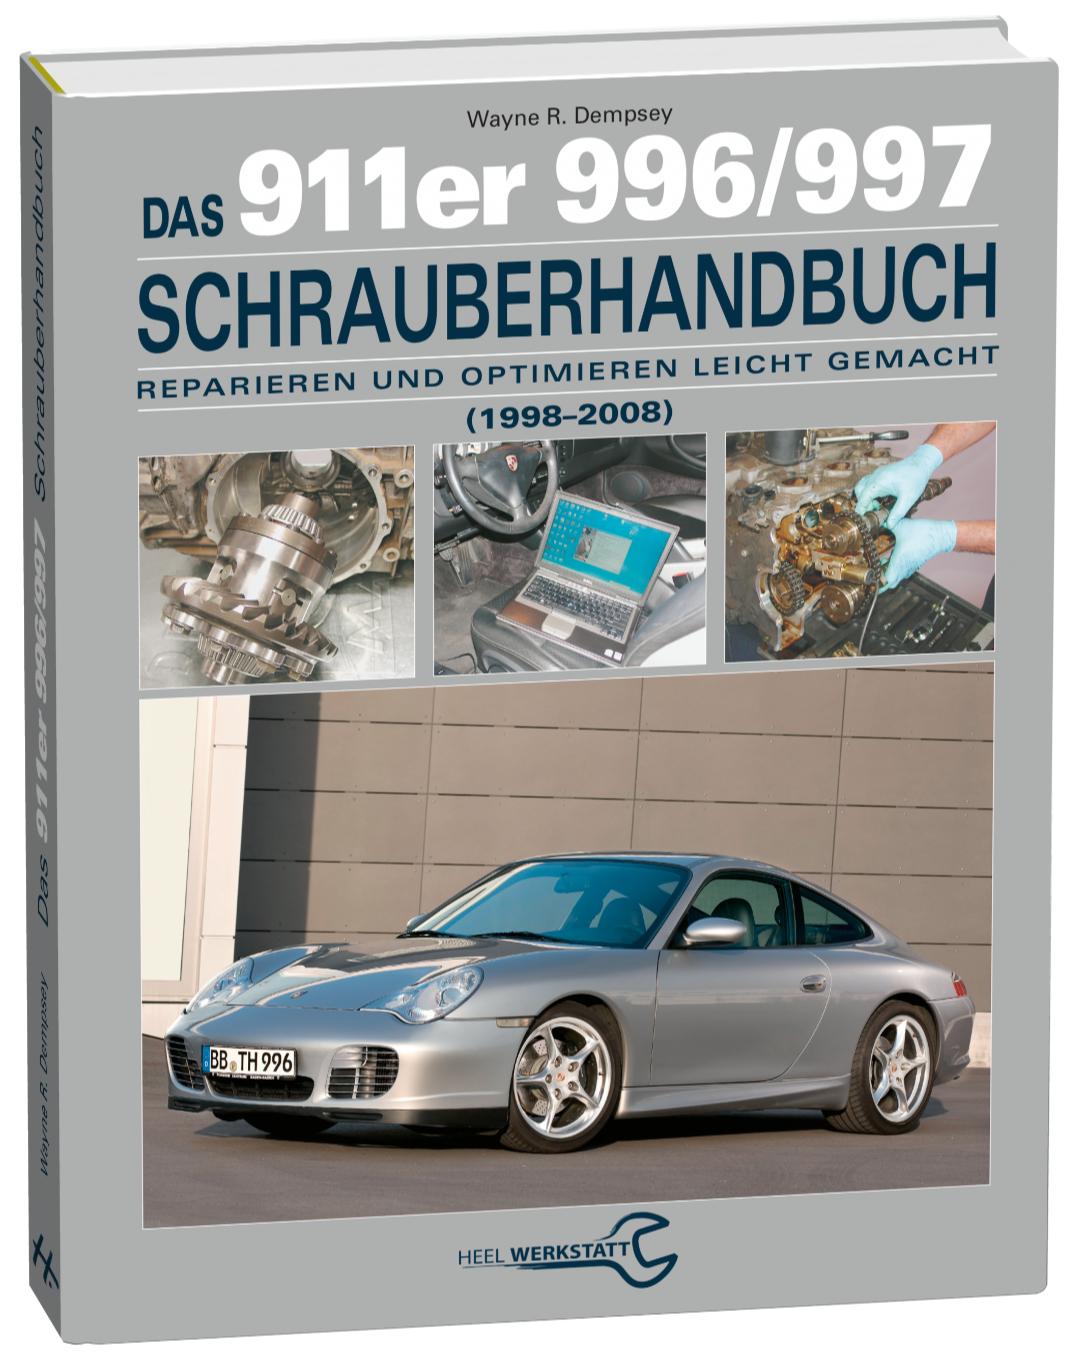 Das 911er 996/997 Schrauberhandbuch